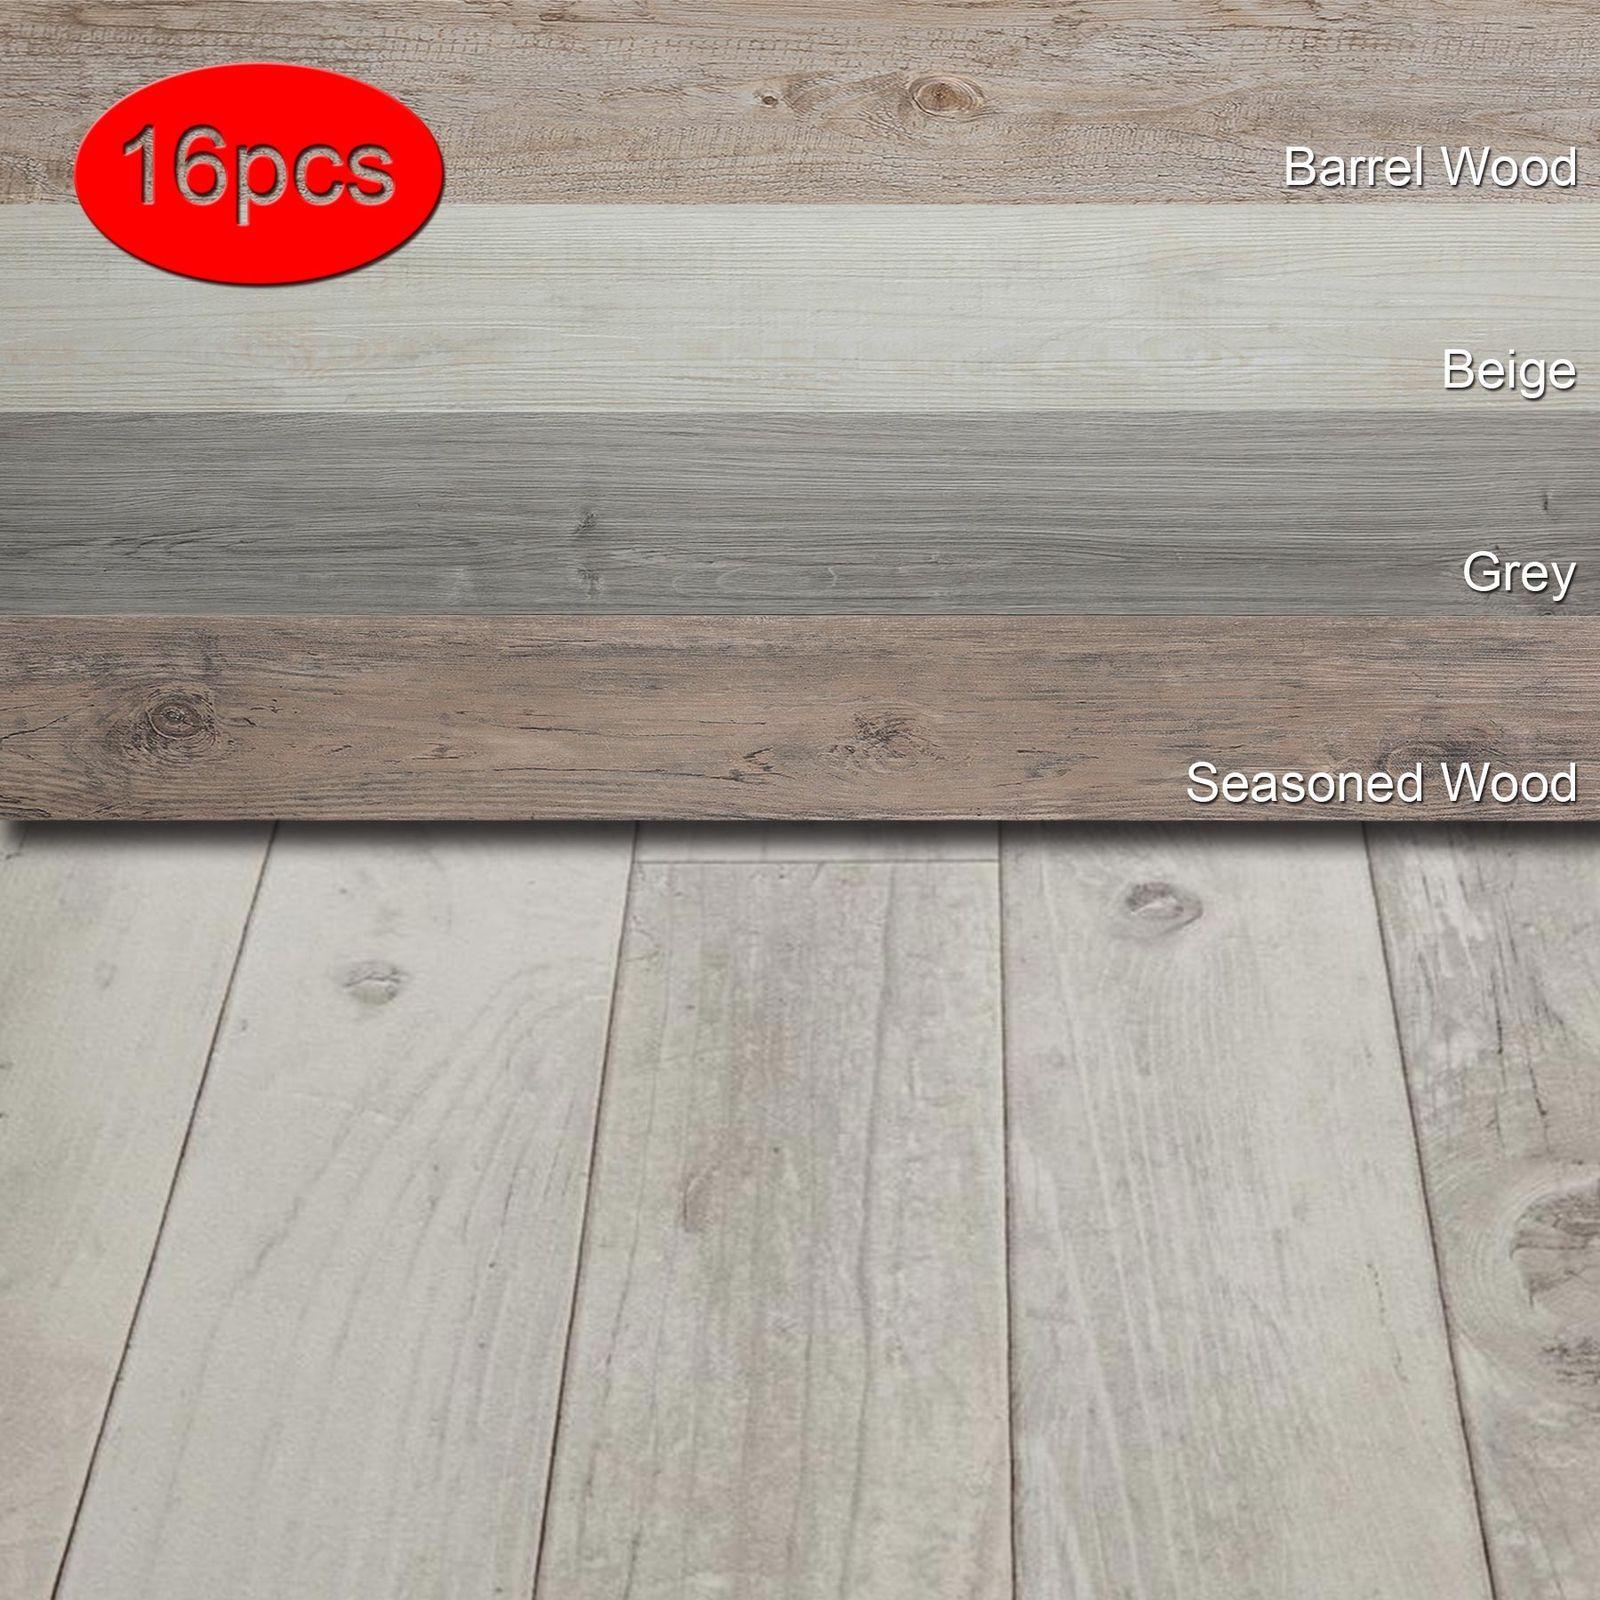 Details About 16 Pcs Vinyl Floor Planks Adhesive Floor Tiles 2 0mm Thick Easy Installation Vinyl Flooring Adhesive Floor Tiles Flooring